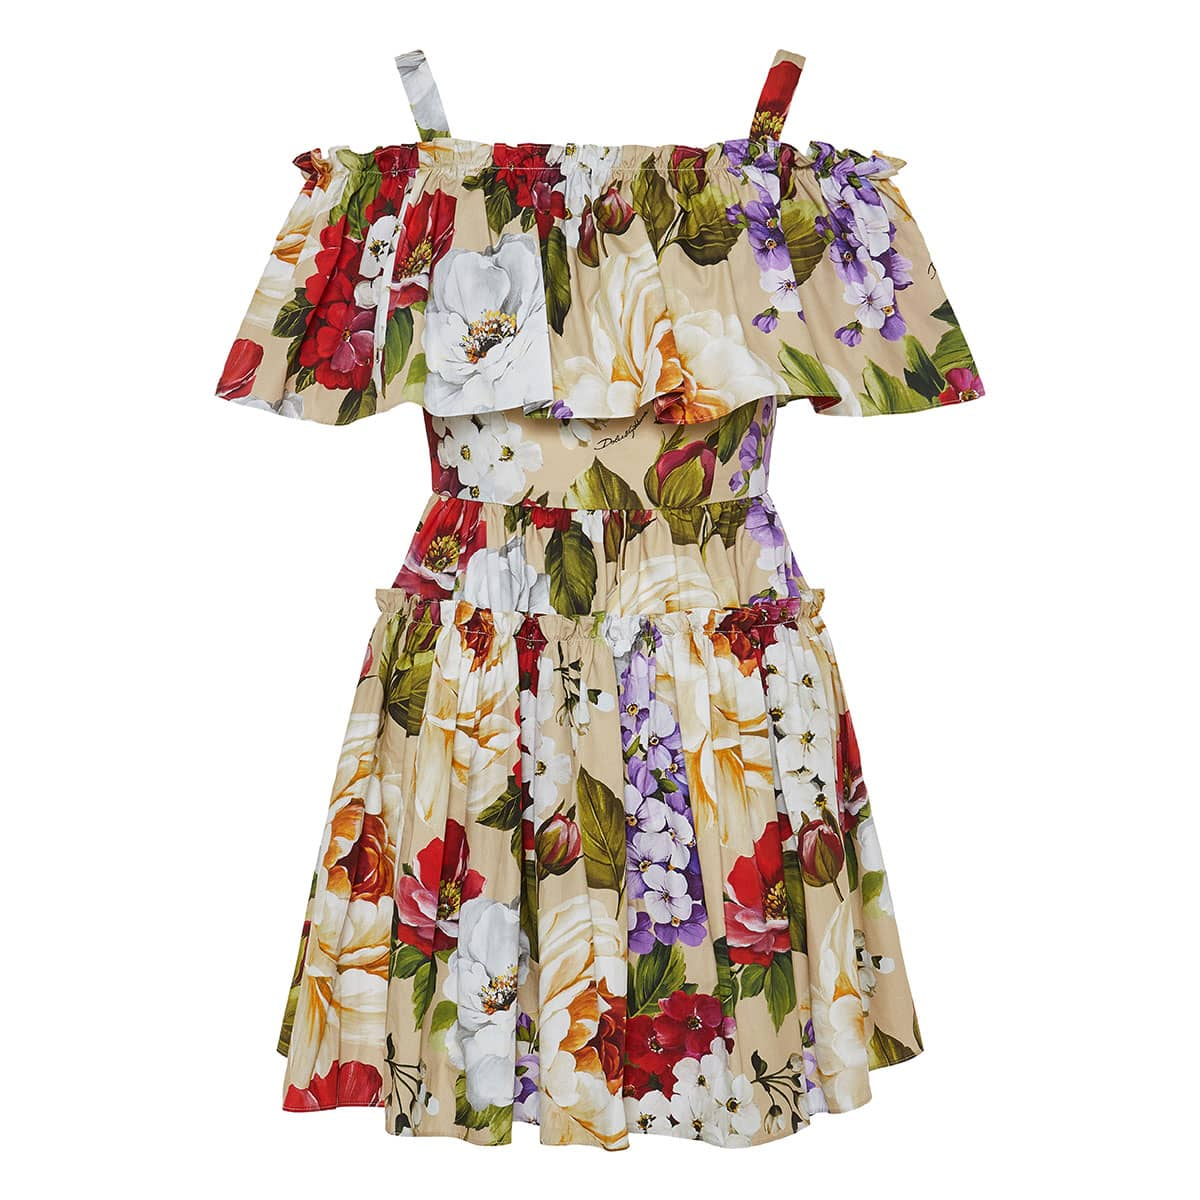 Floral ruffled pleated mini dress